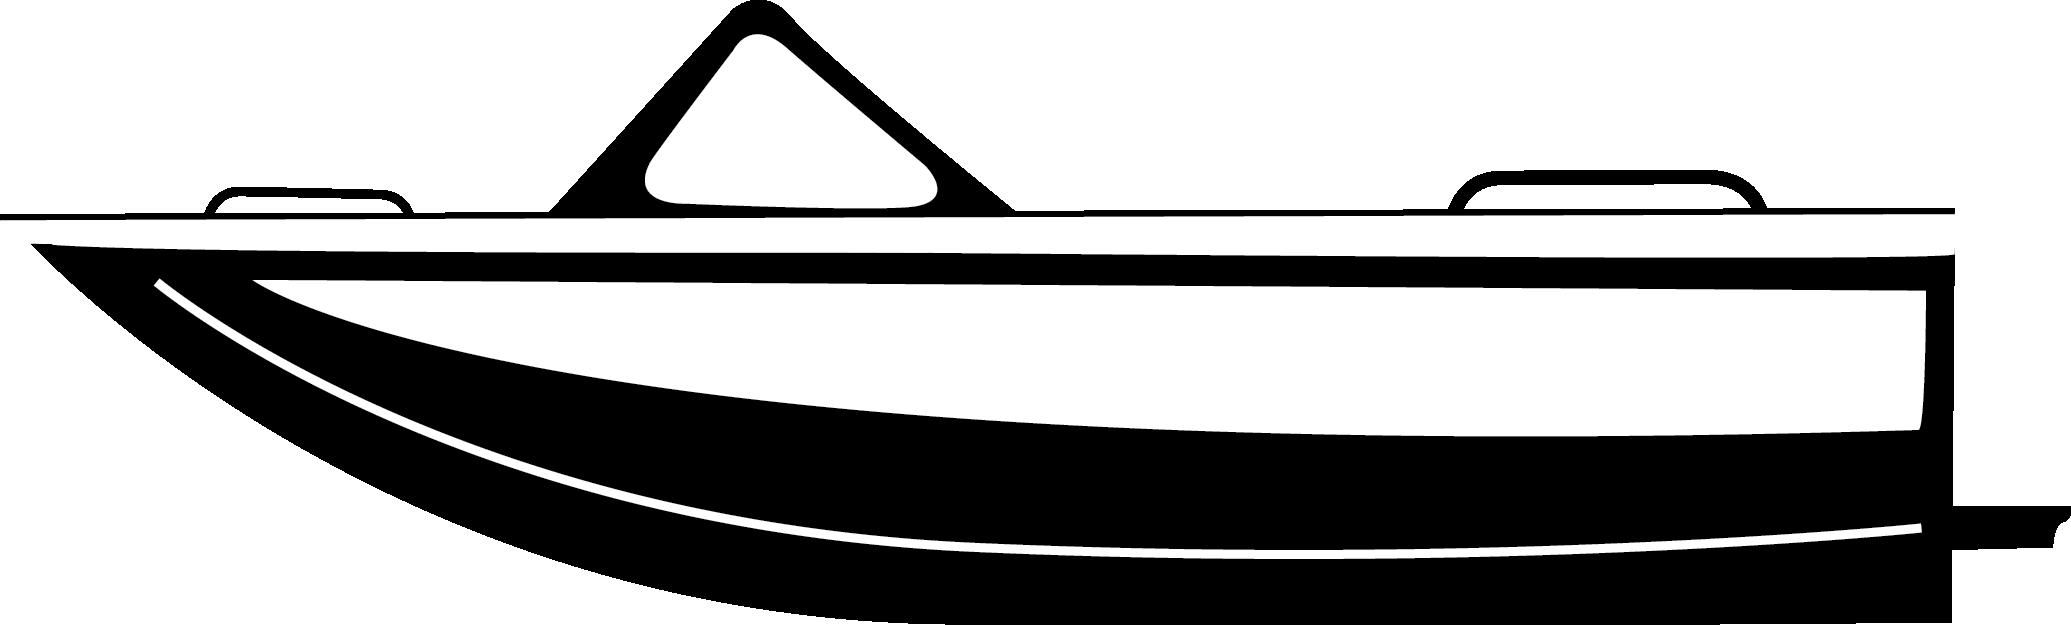 Weldcraft Marine